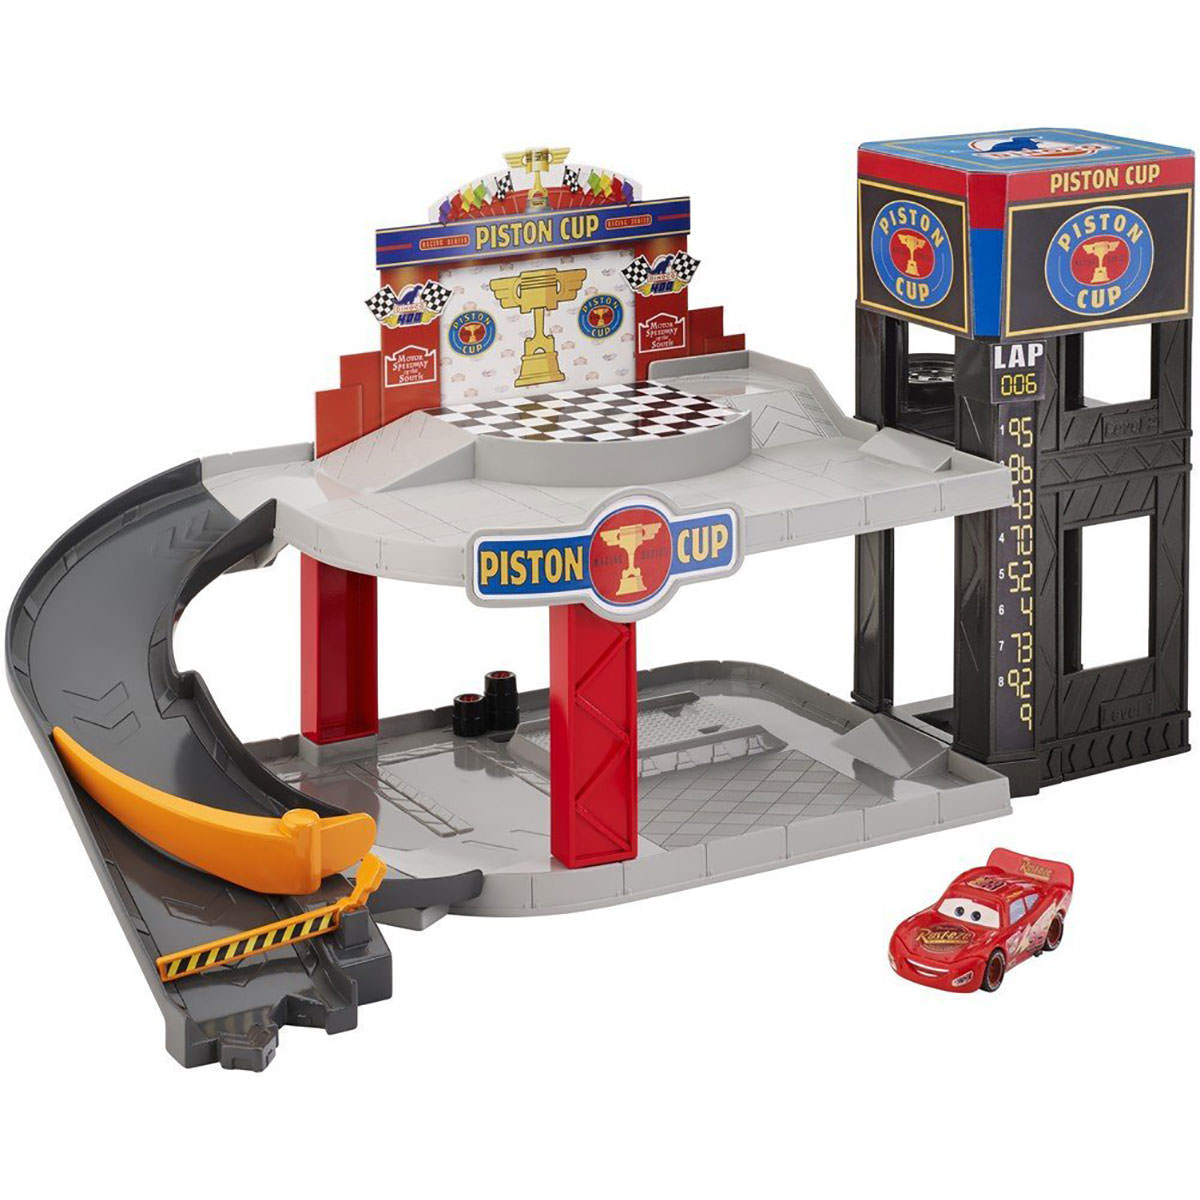 Pixar Cars Piston Cup Racing Garage At Hobby Warehouse